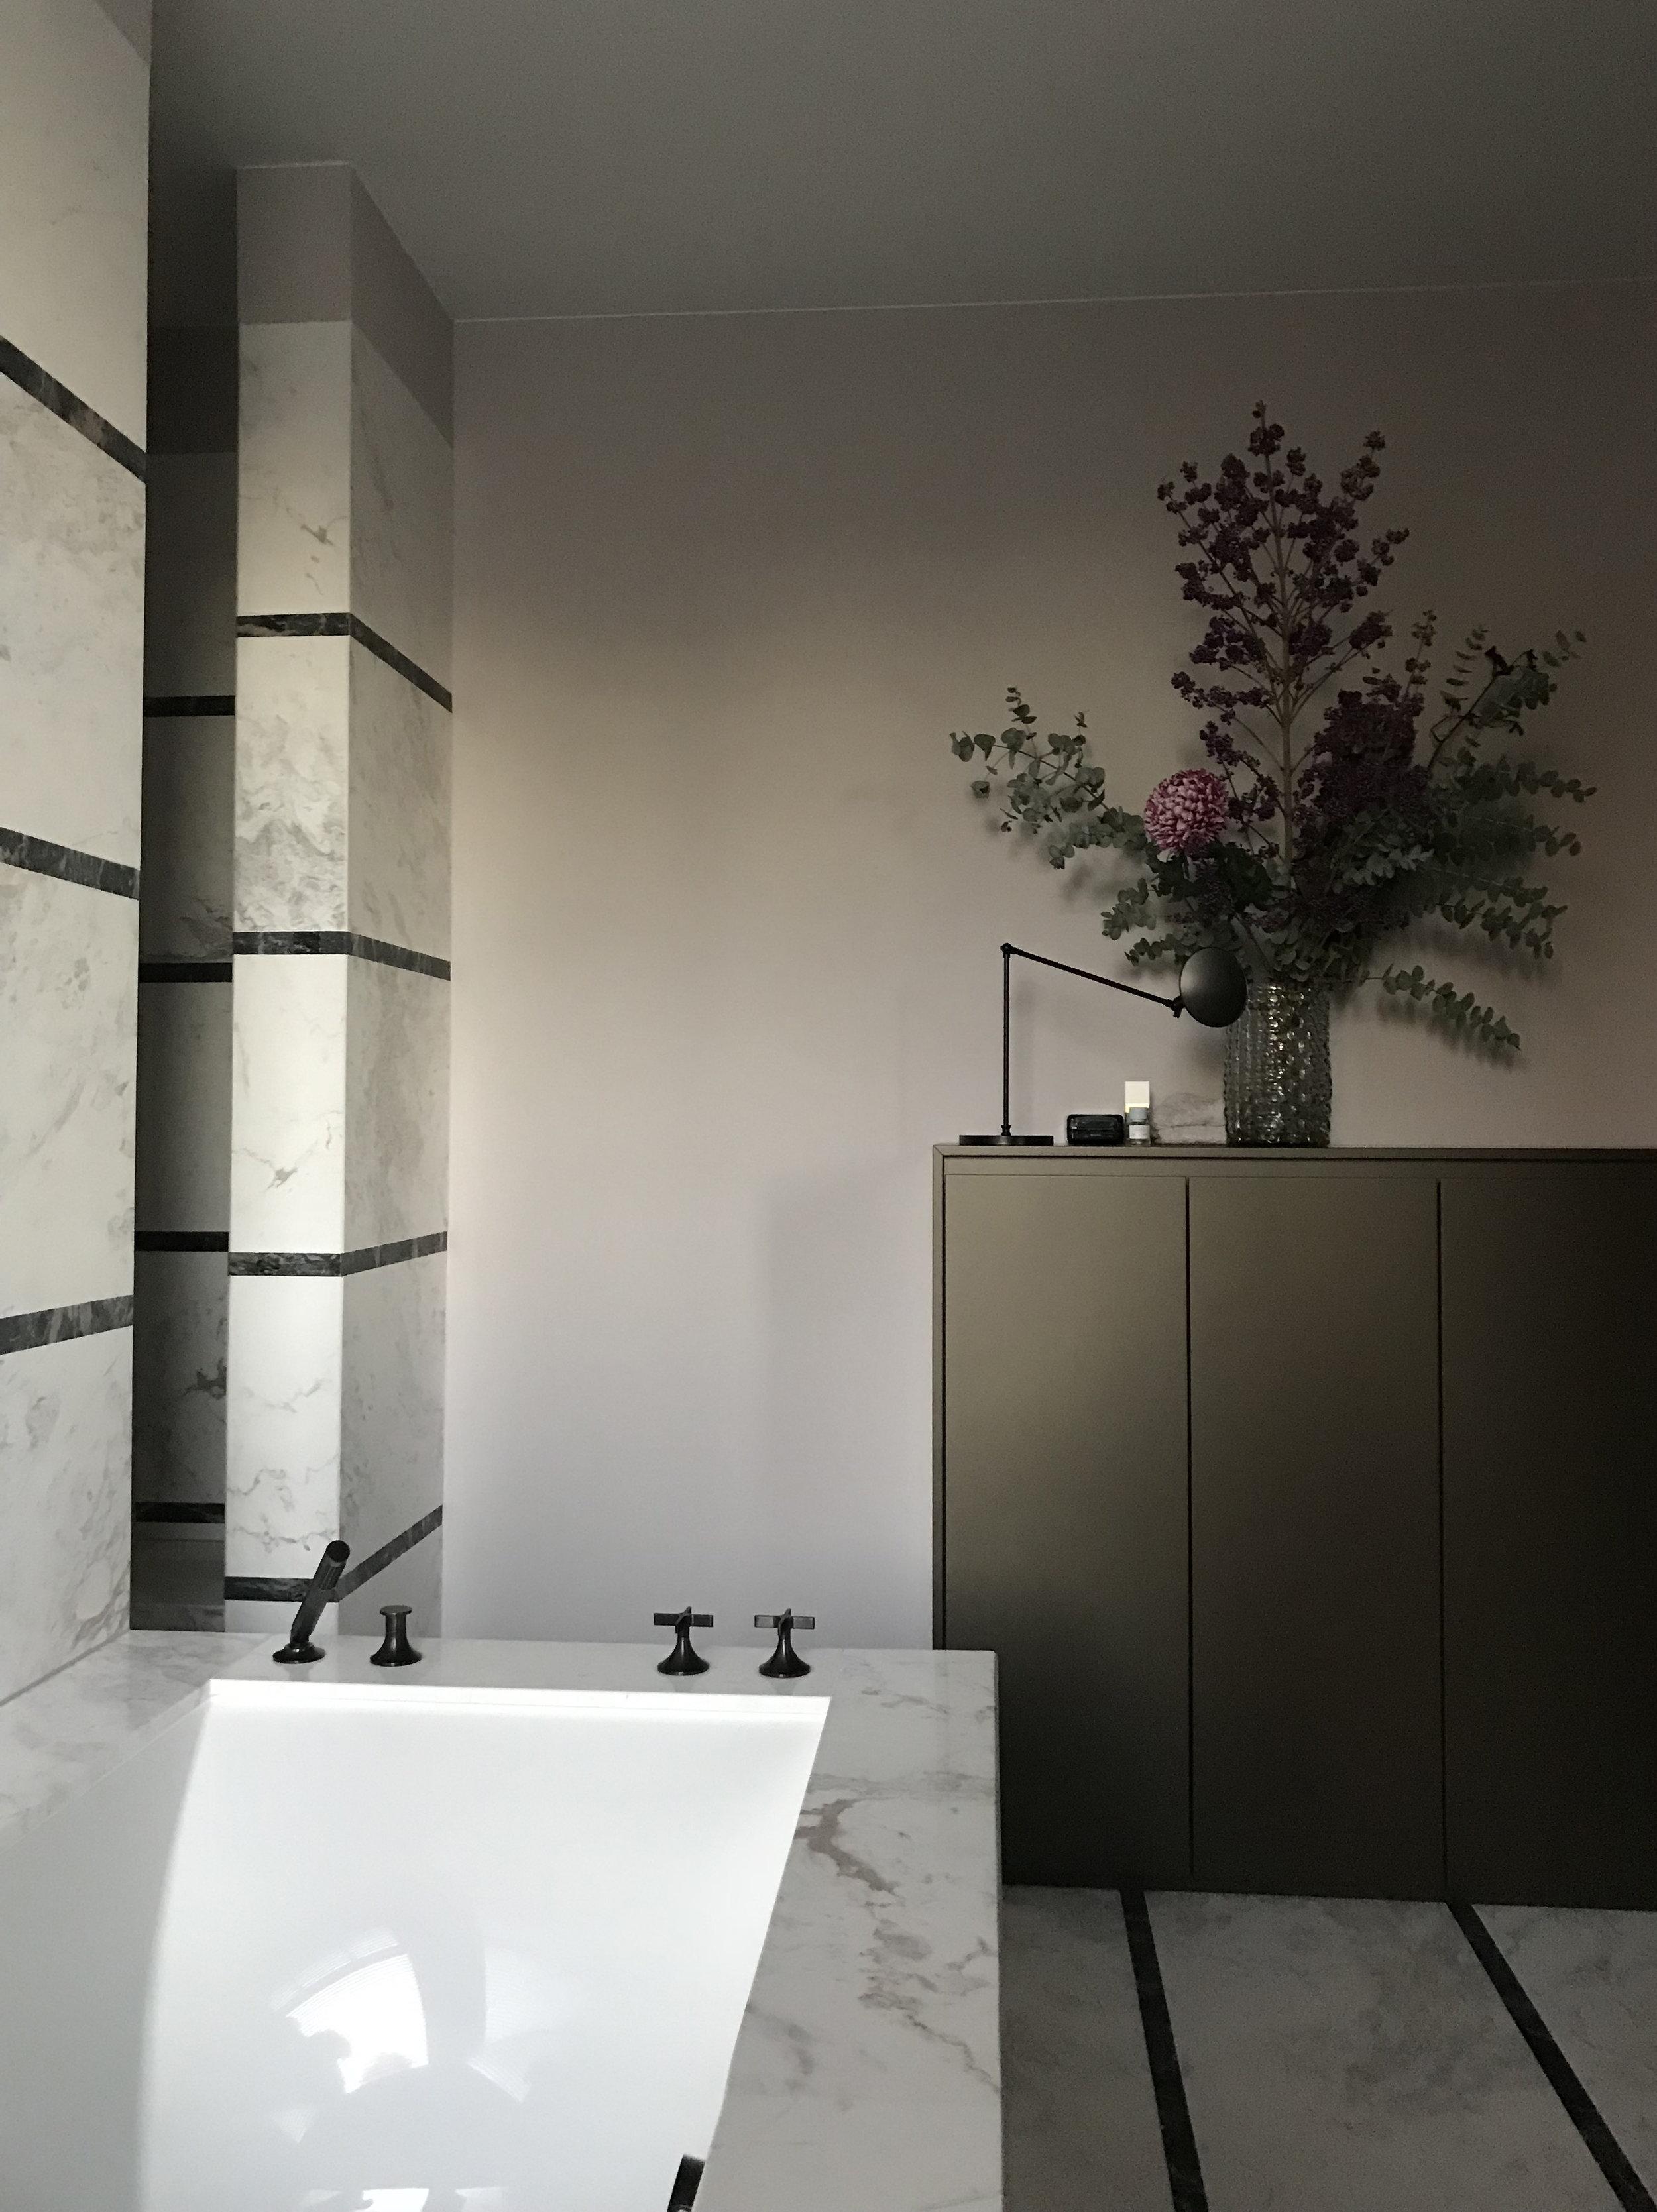 002 lex de gooijer interiors 24 bathroom design.jpg